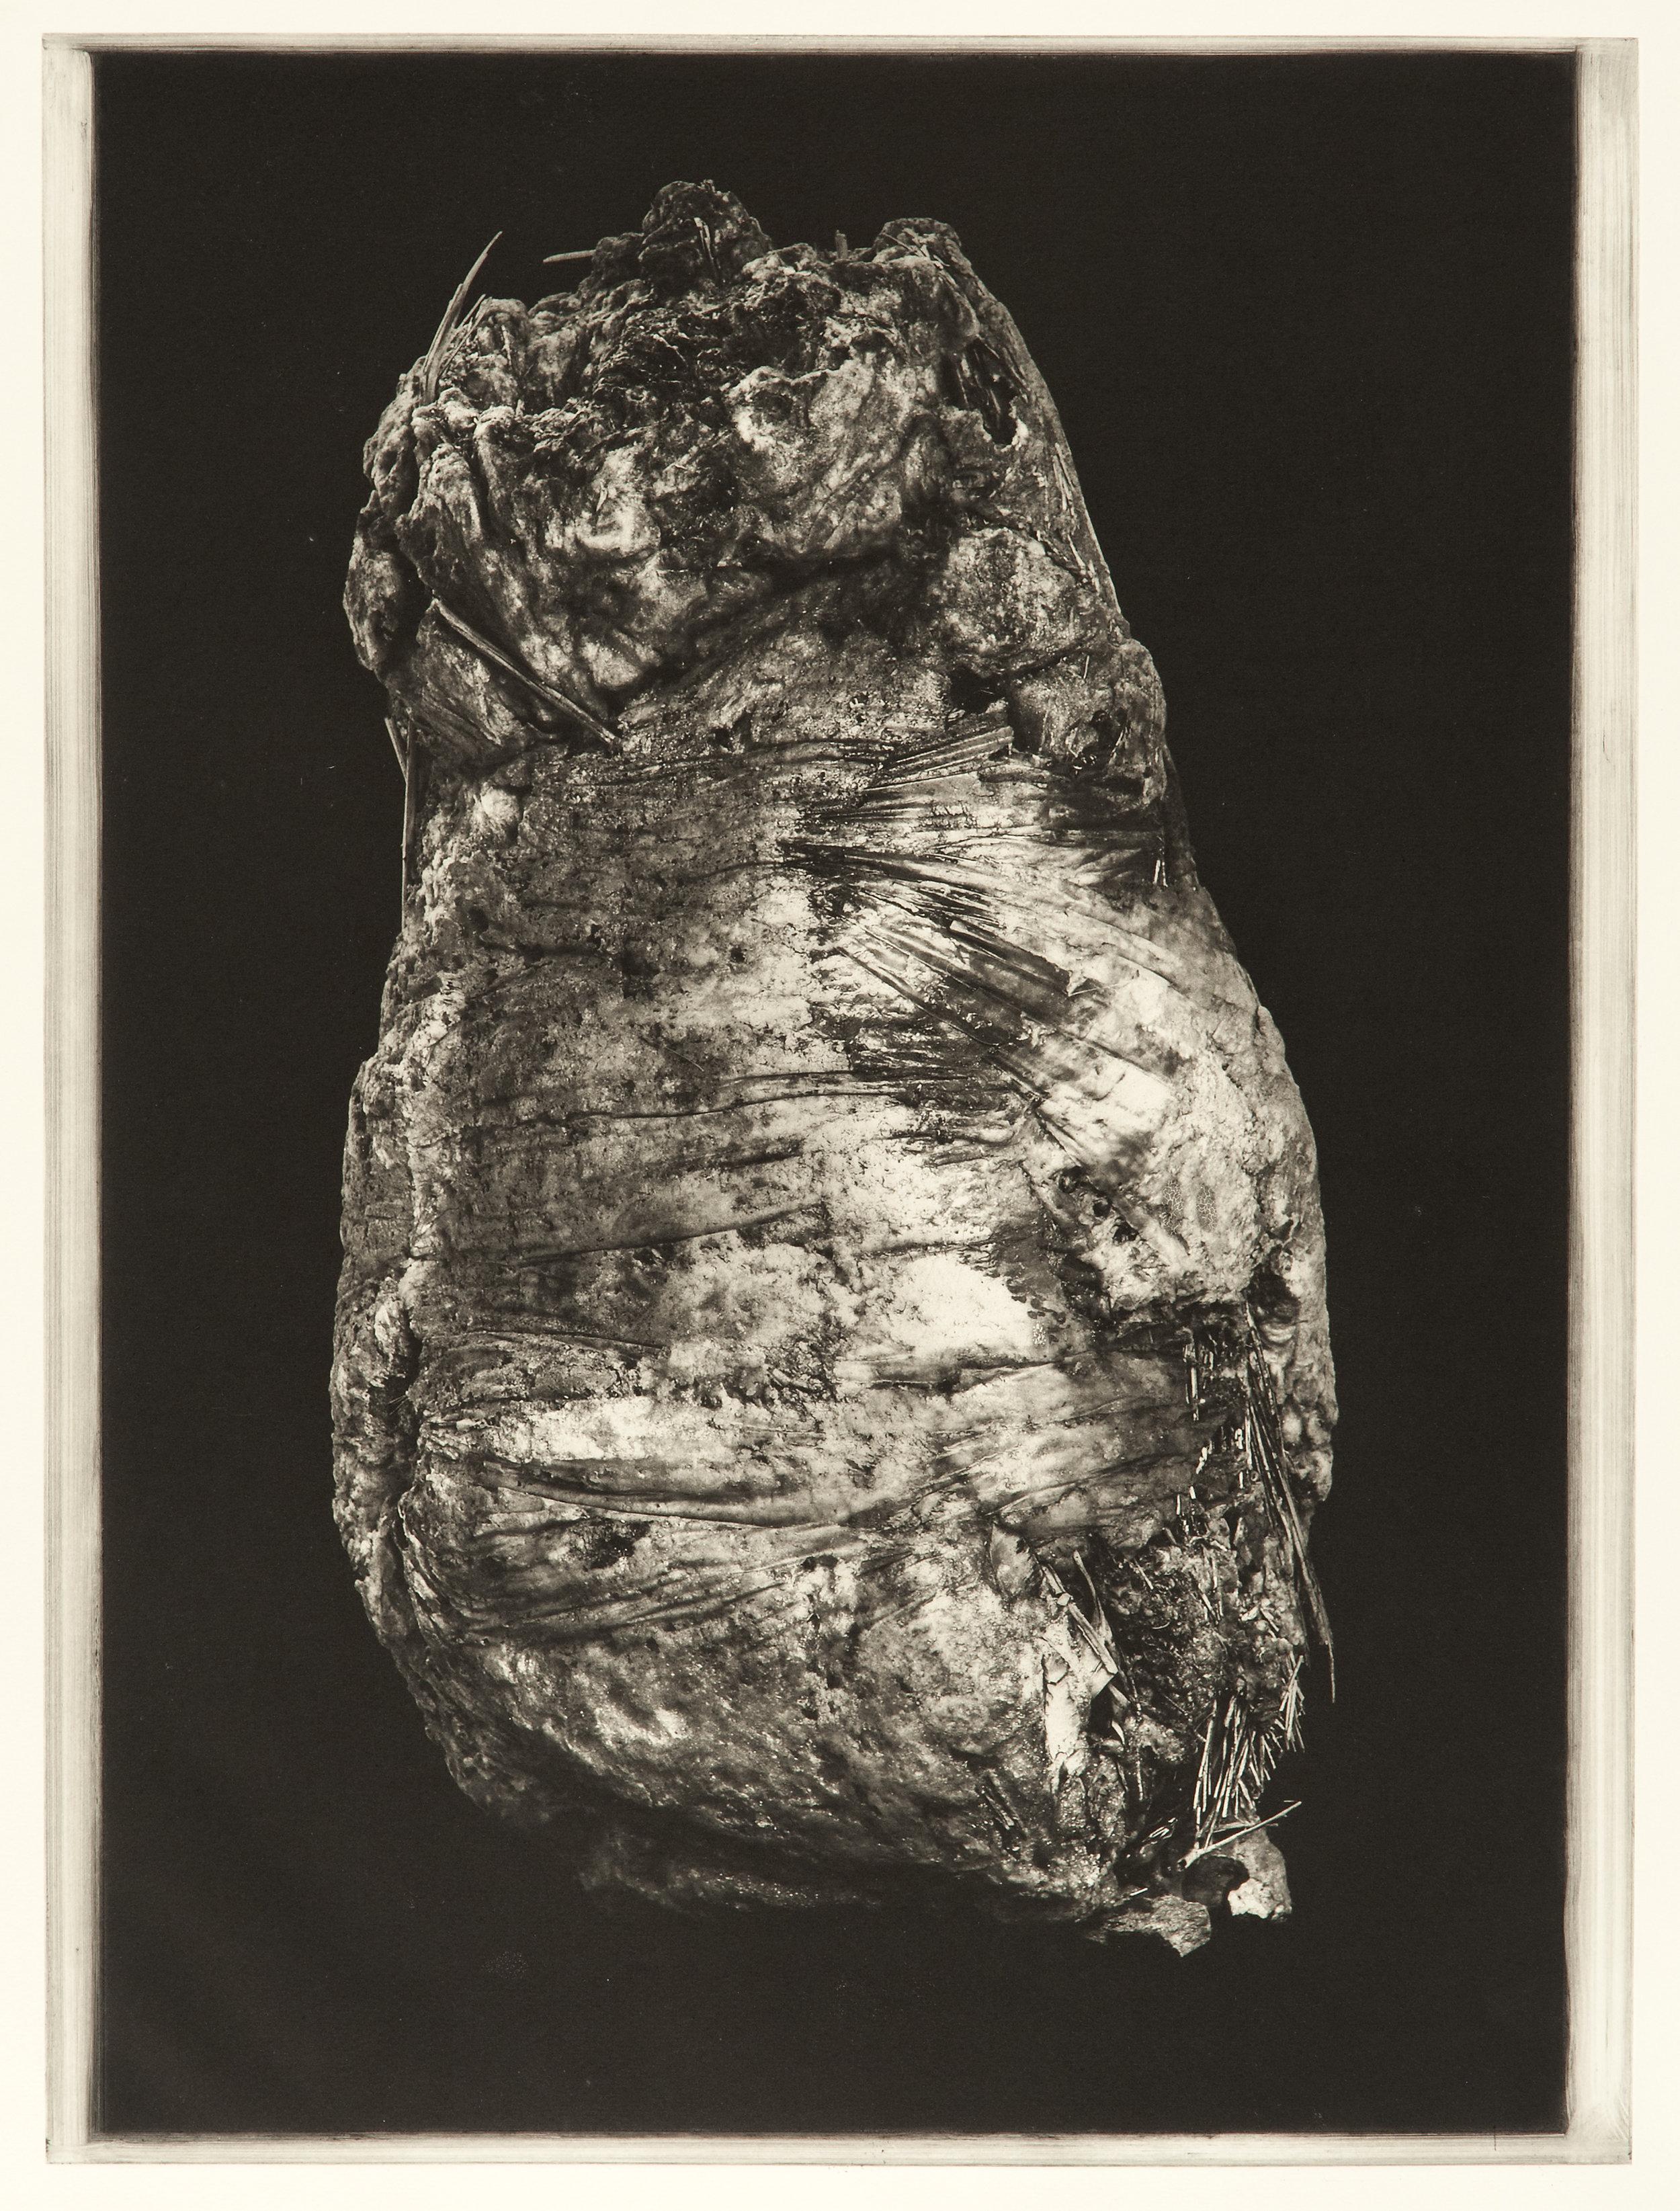 """Degeneration # 4475"", 22"" x 30"", photogravure of urethane sculpture weathered"